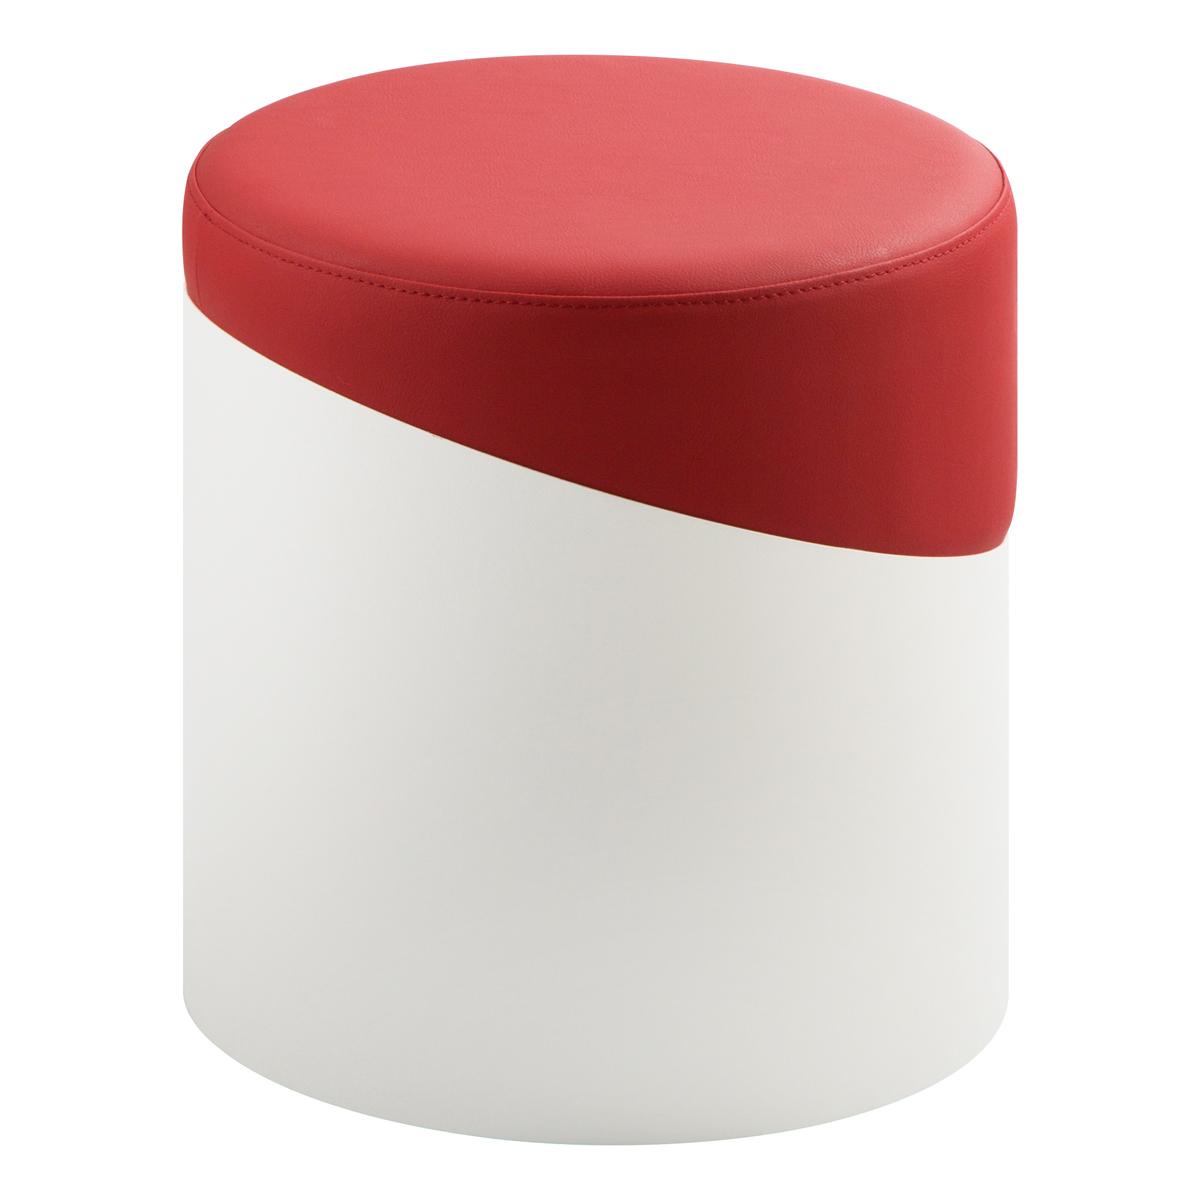 Hocker Nar, weiß-rot